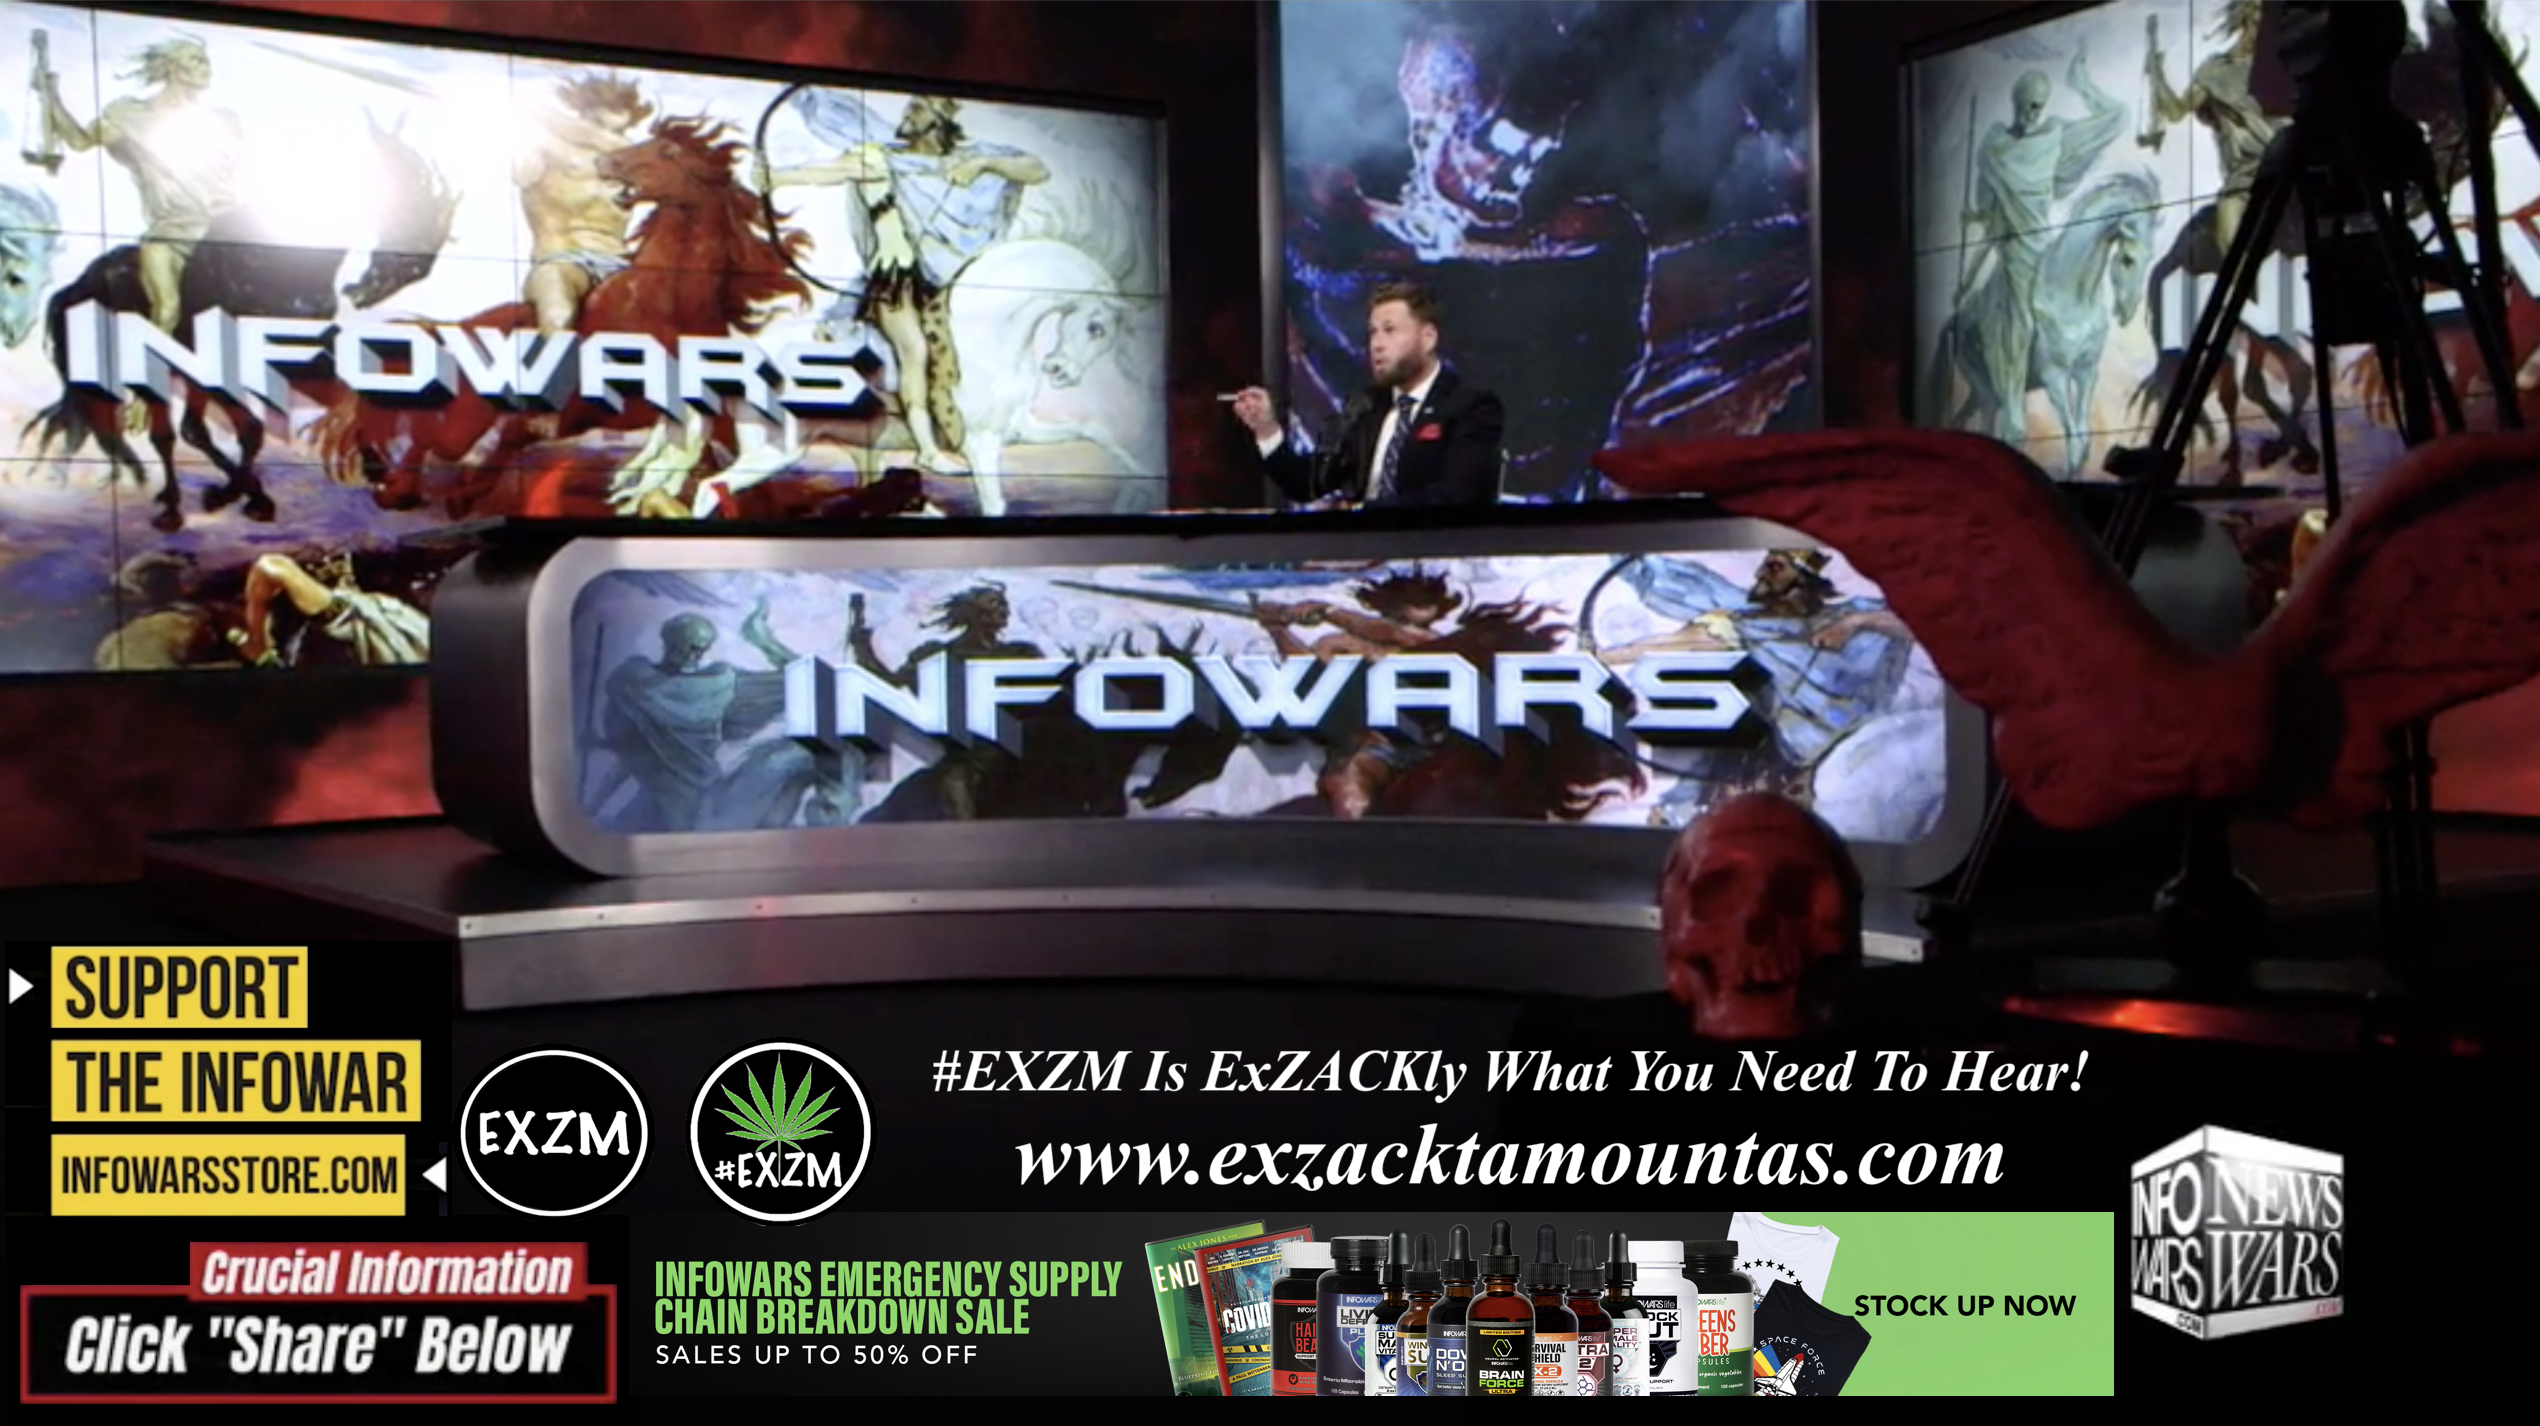 Alex Jones Owen Shroyer Live In Infowars Studio Human Skull Angel Wings Dagger Free World News TV EXZM Zack Mount October 11th 2021 copy